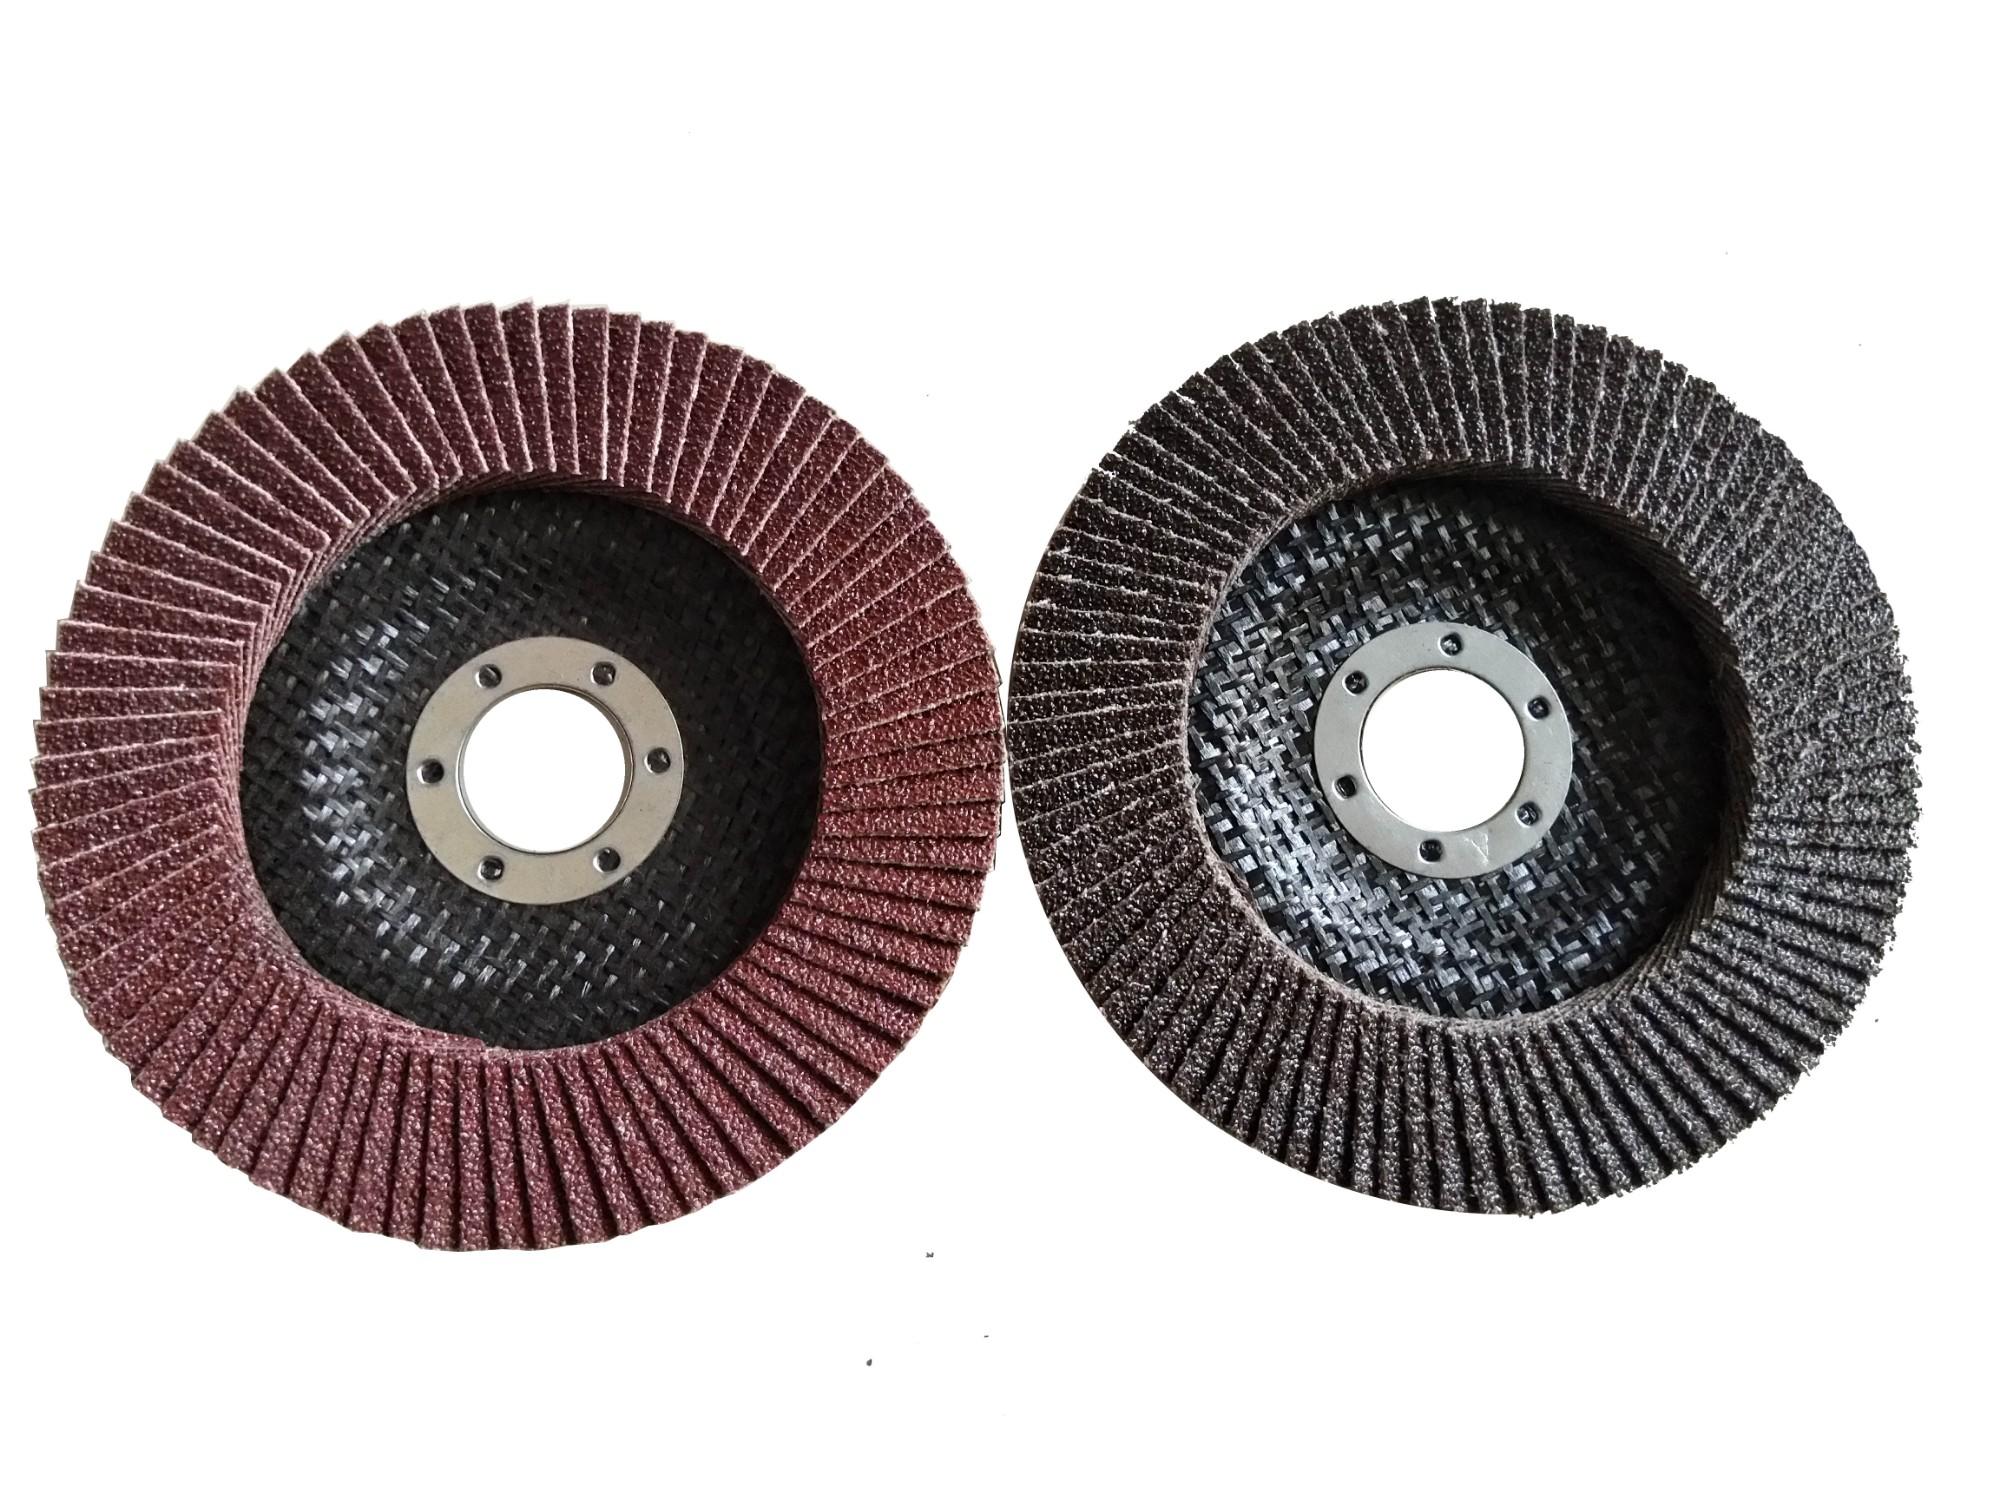 Deep Pressed Center Buffing Polish Disc Wheel Manufacturers, Deep Pressed Center Buffing Polish Disc Wheel Factory, Supply Deep Pressed Center Buffing Polish Disc Wheel